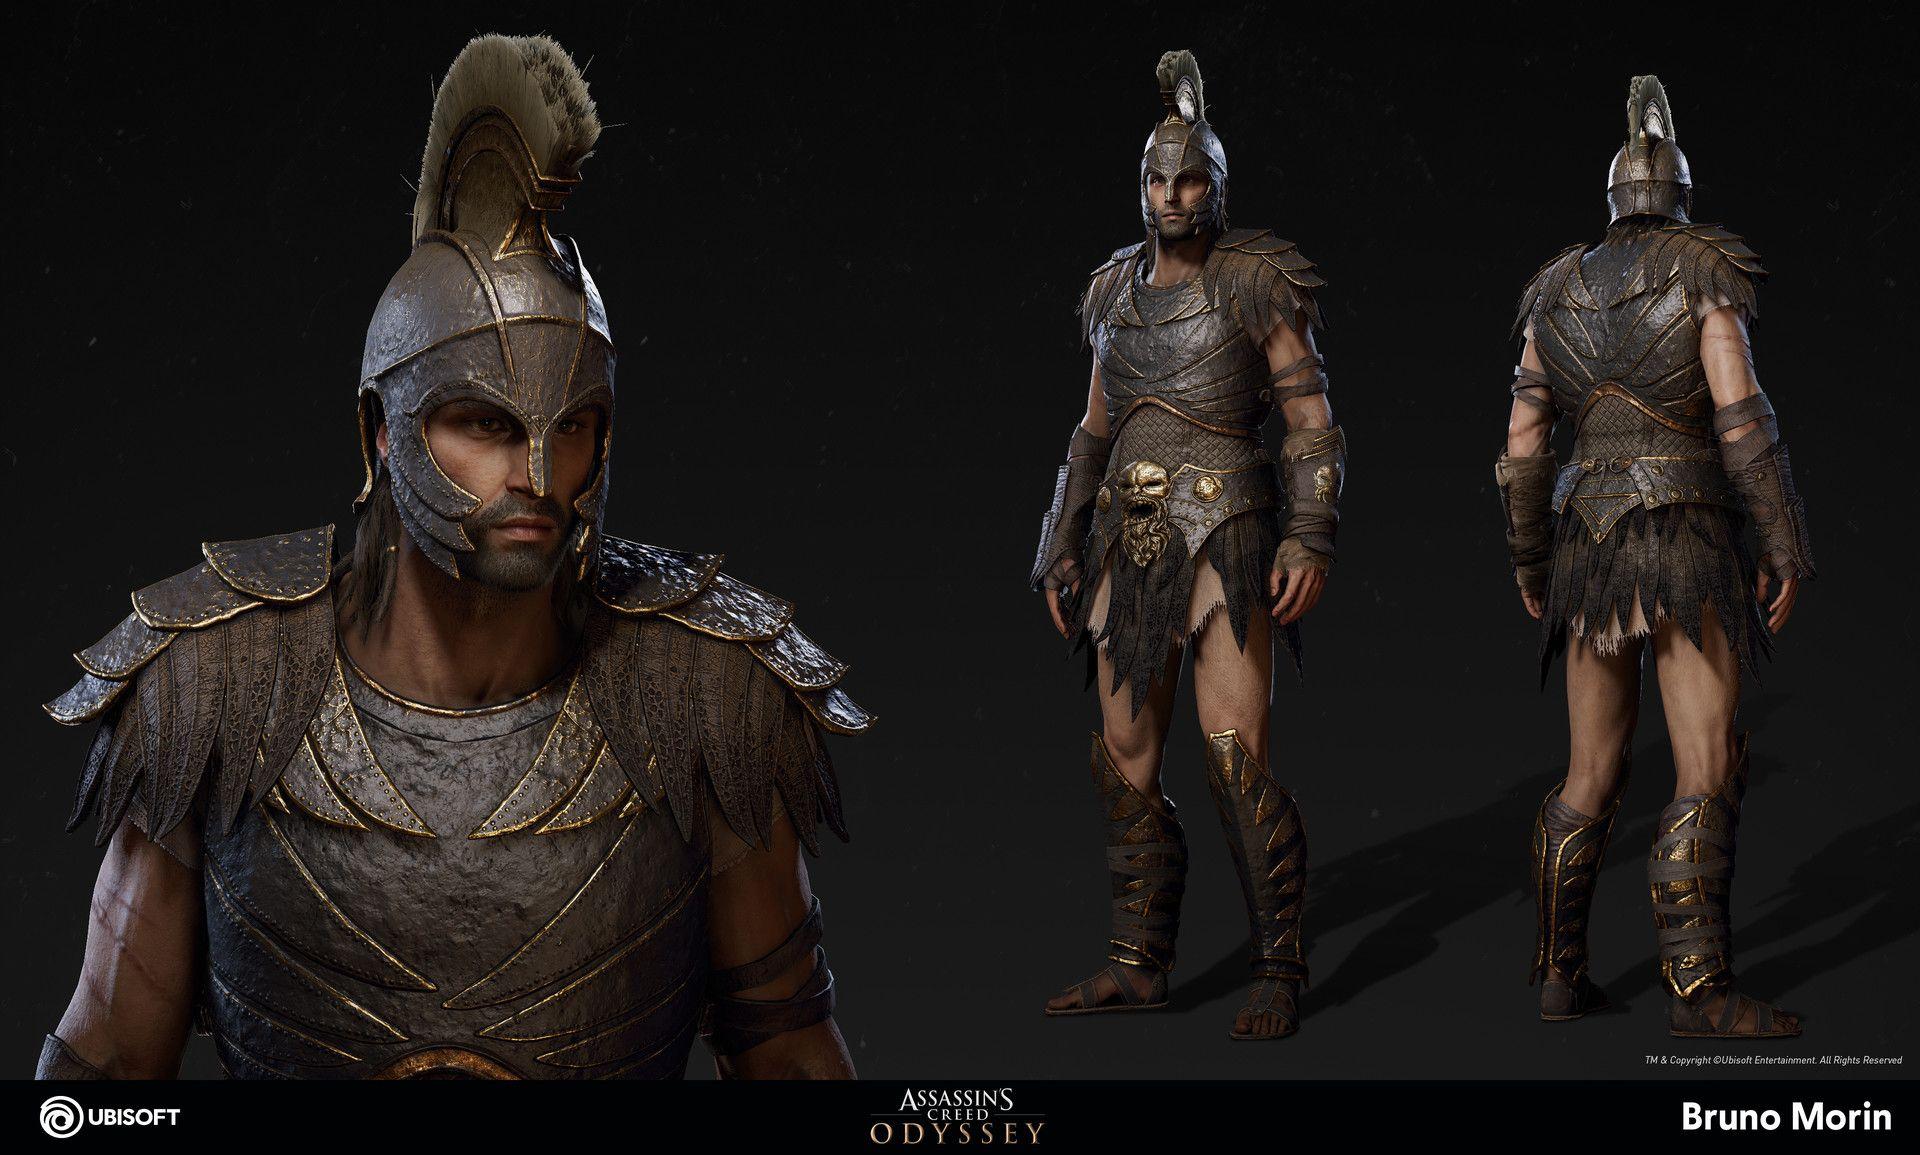 assassins creed odyssey assassins armor - HD1600×963